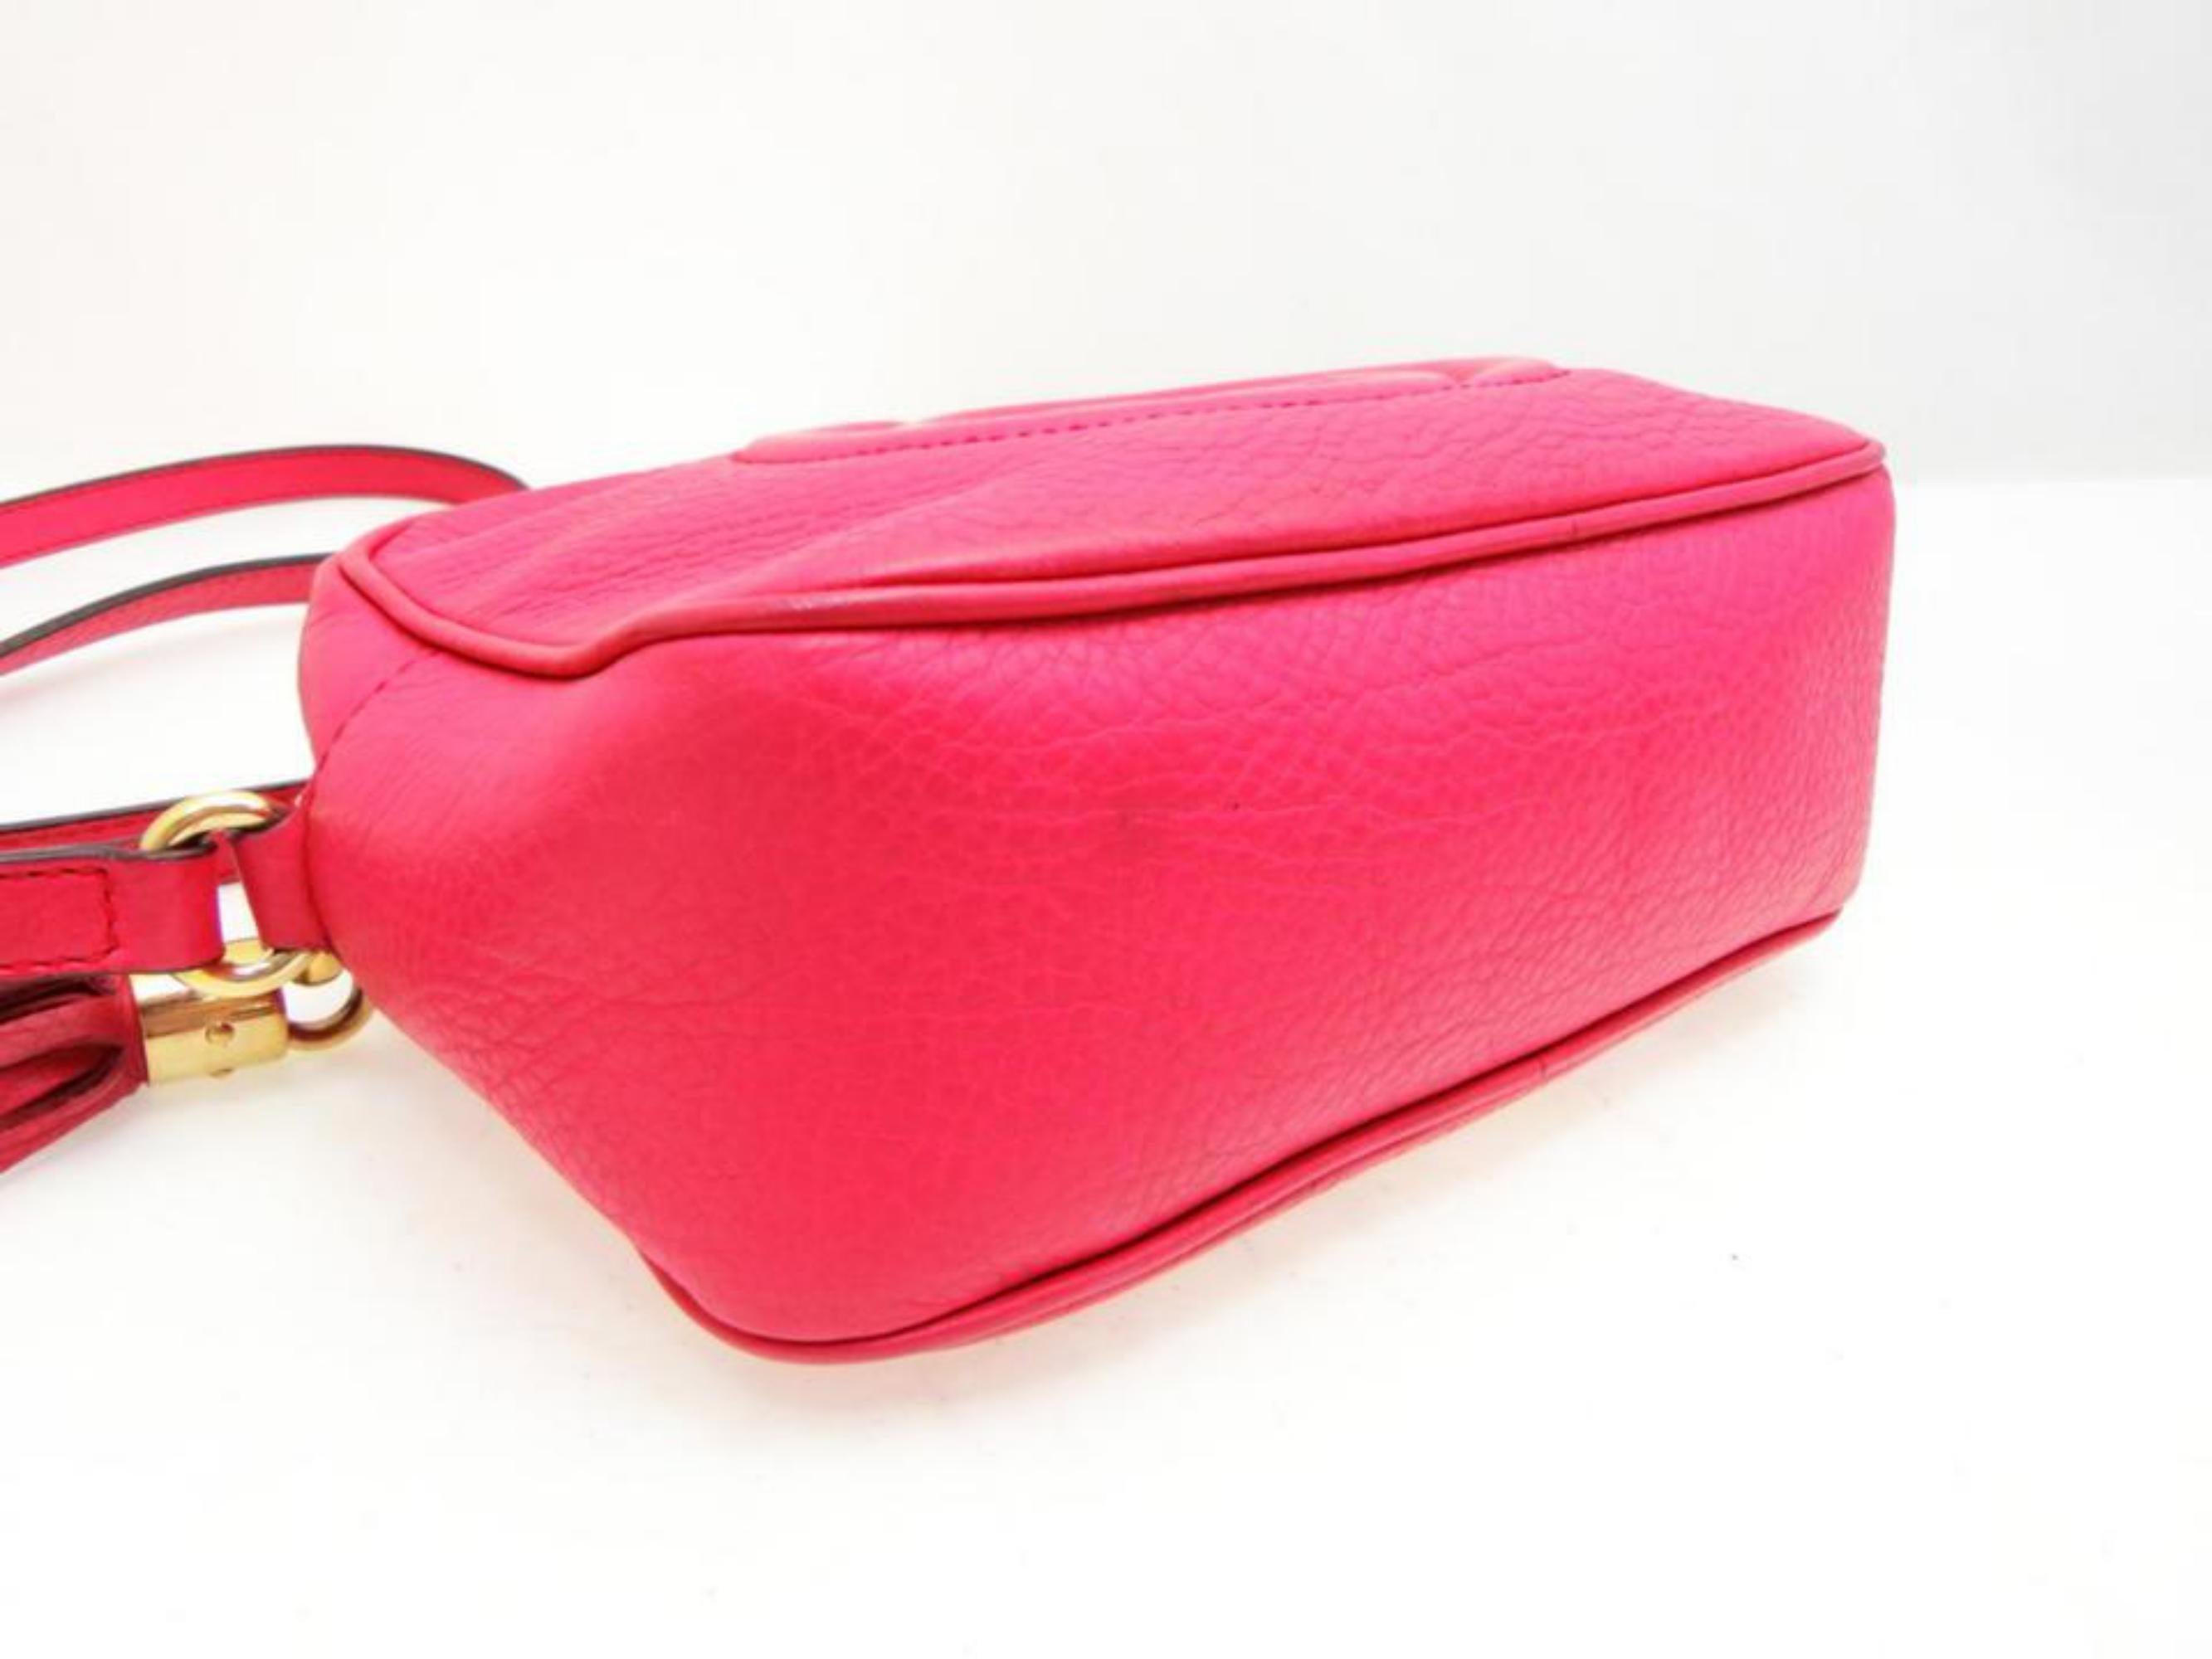 6547849abe4 Gucci Soho Fuchsia Fringe Tassel Disco 230924 Pink Leather Cross Body Bag  For Sale at 1stdibs